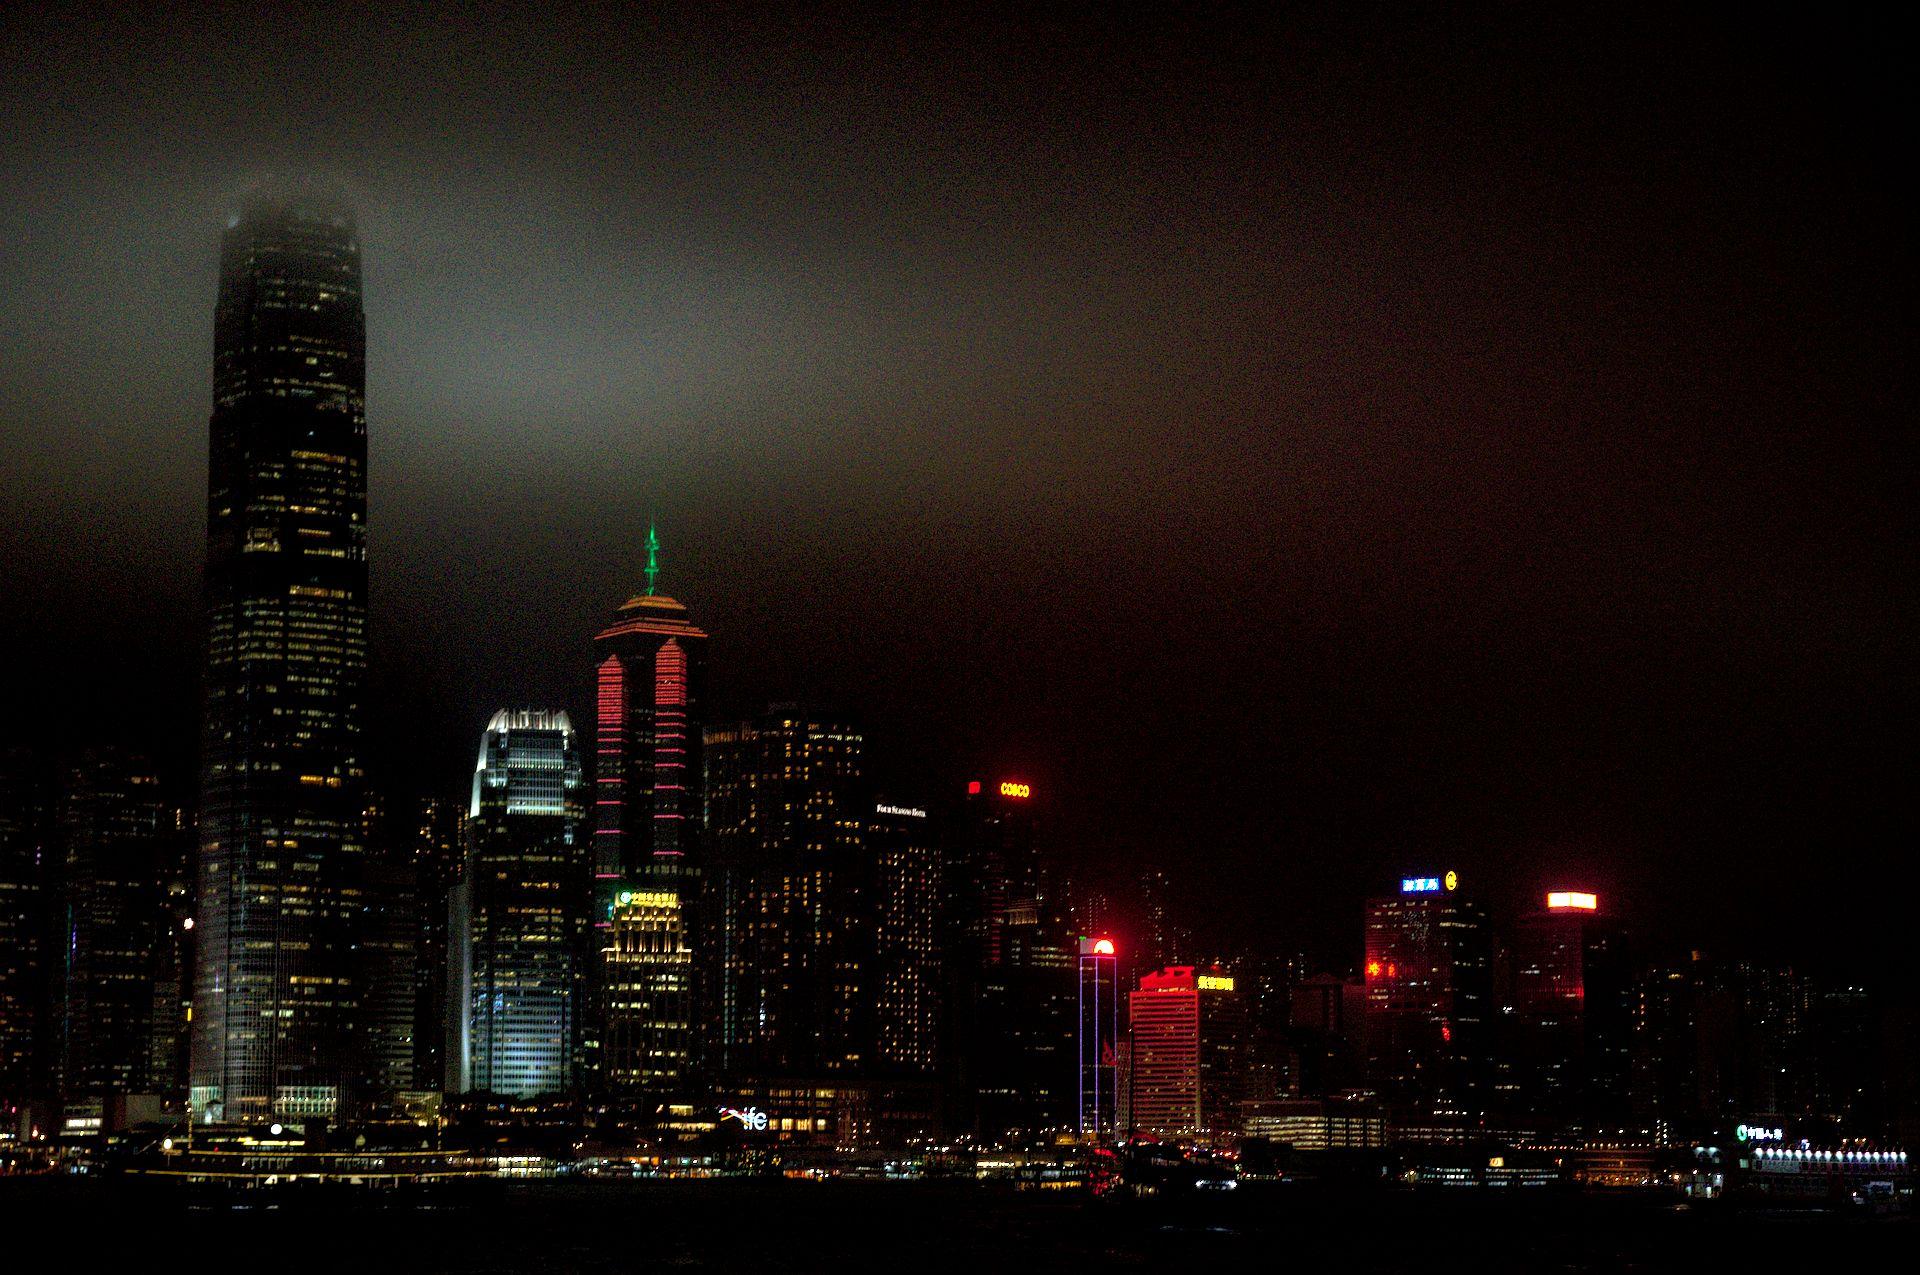 Mucho de todo en Hong Kong